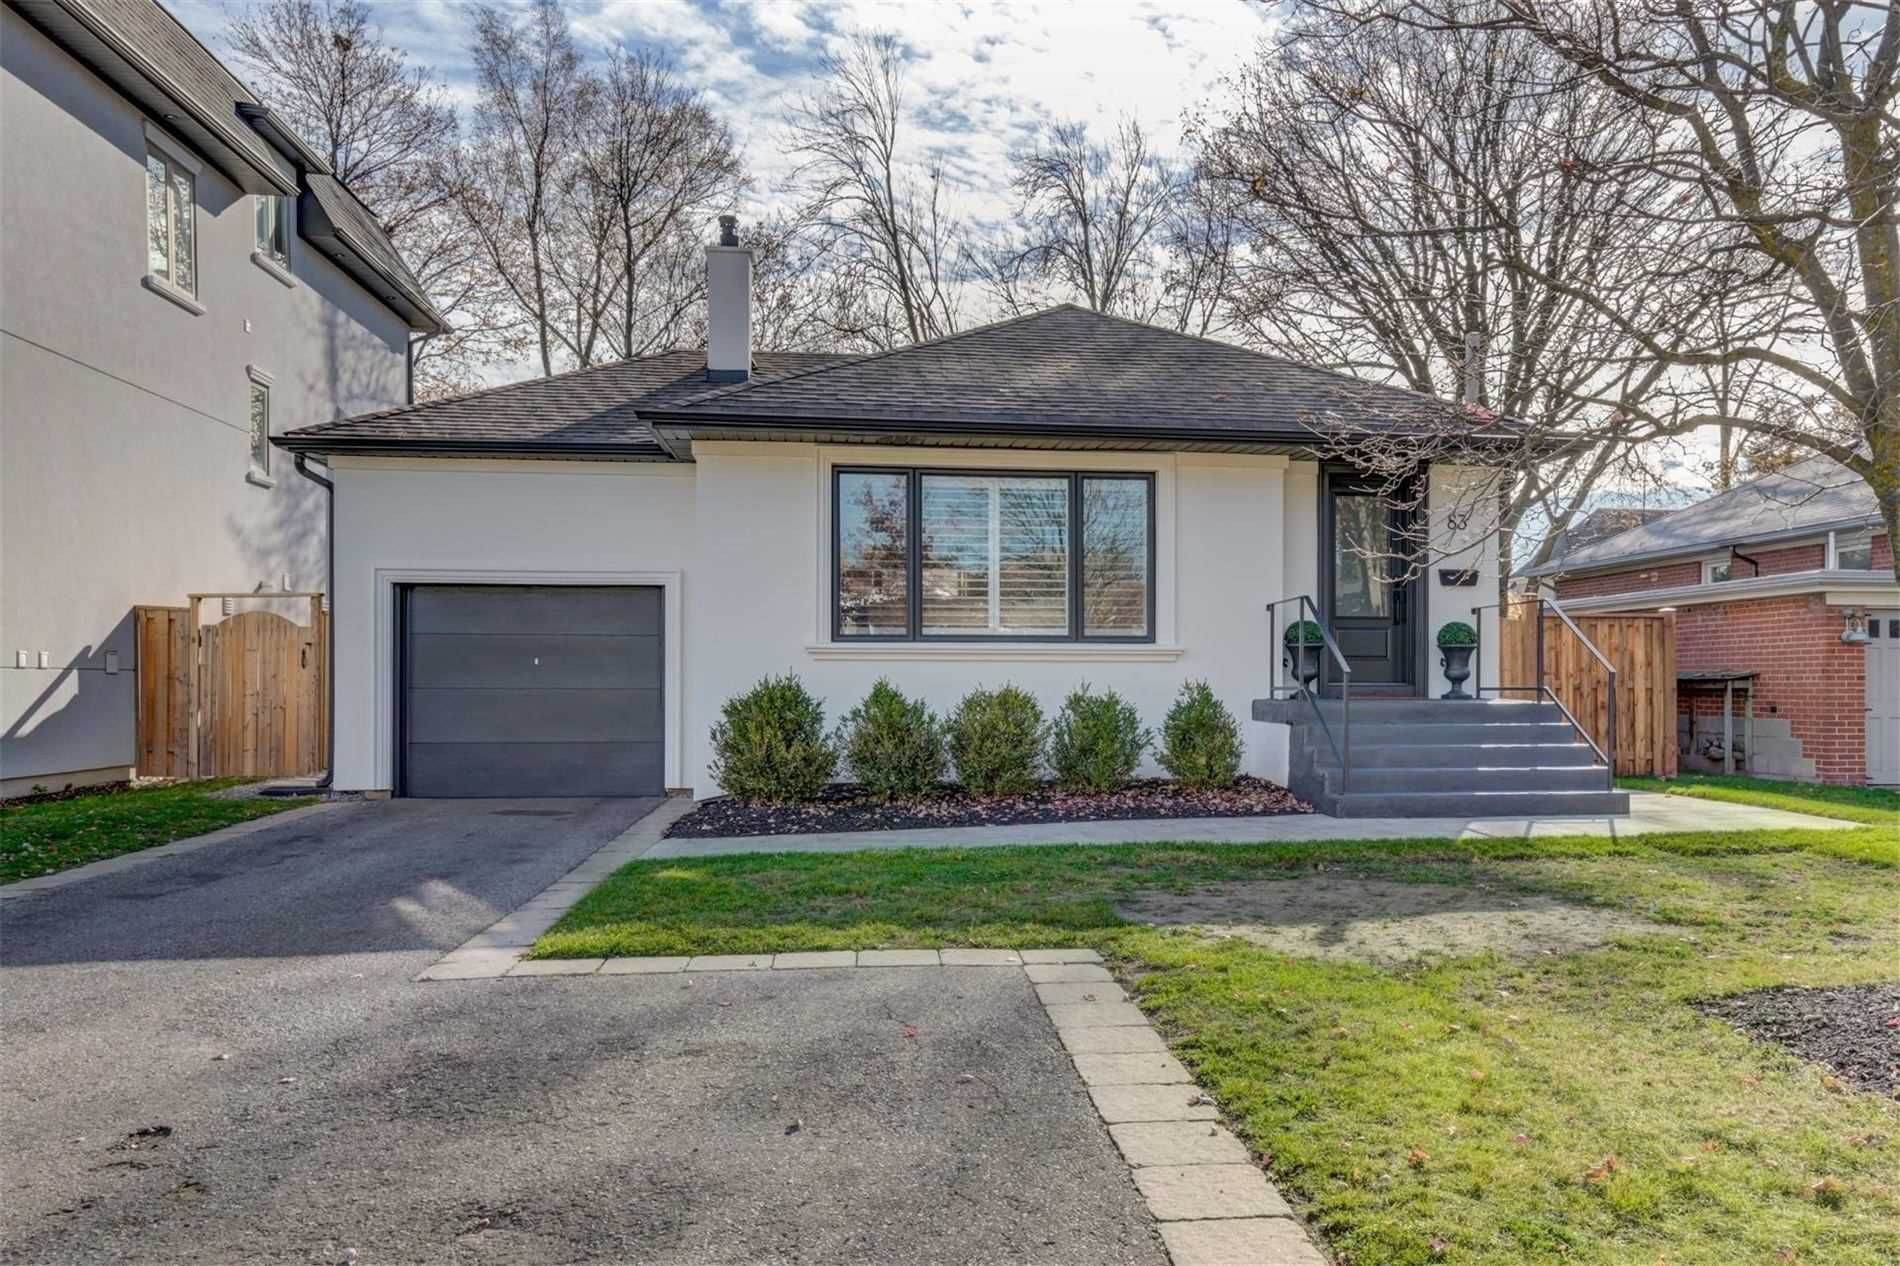 Main Photo: 83 Invermay Avenue in Toronto: Clanton Park House (Bungalow) for sale (Toronto C06)  : MLS®# C5054451